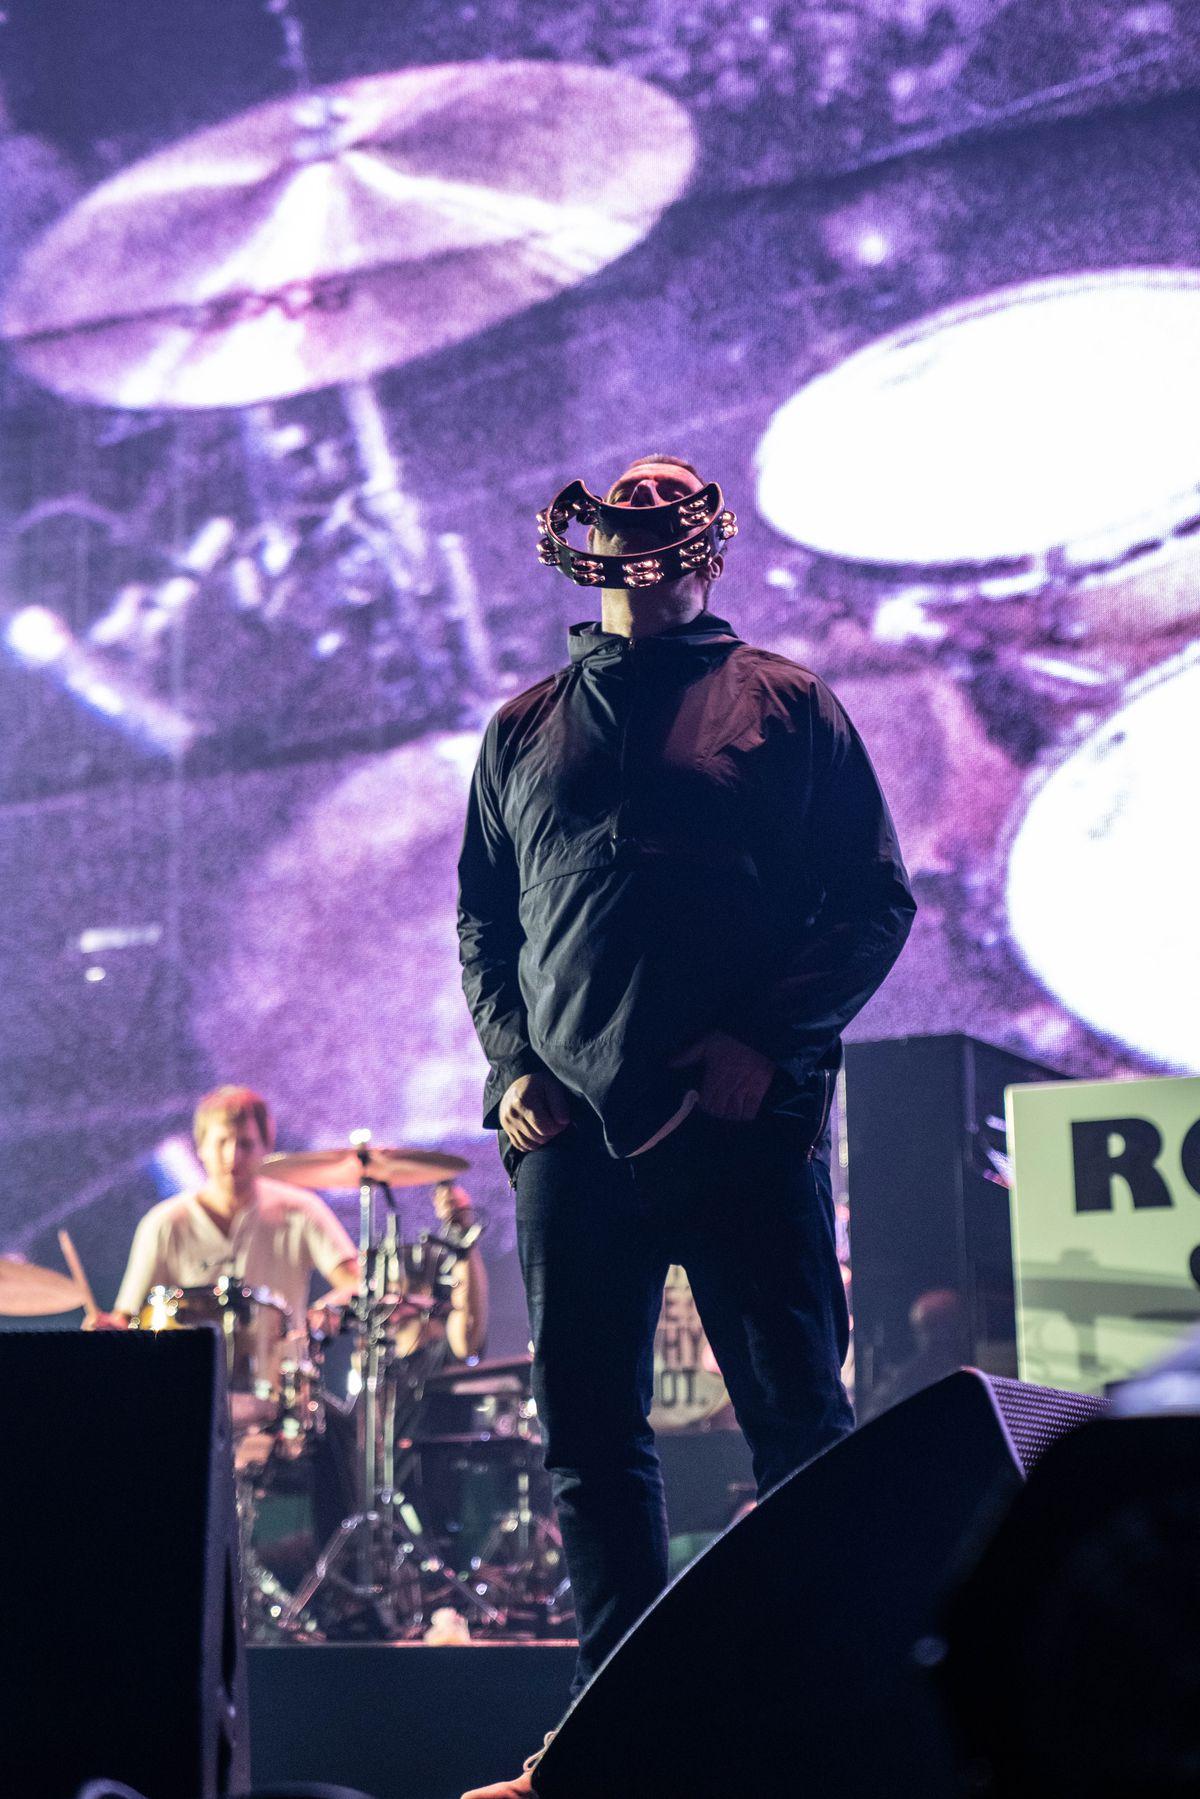 Liam Gallagher brought his tour to Arena Birmingham last night. Picture: Eleanor Sutcliffe